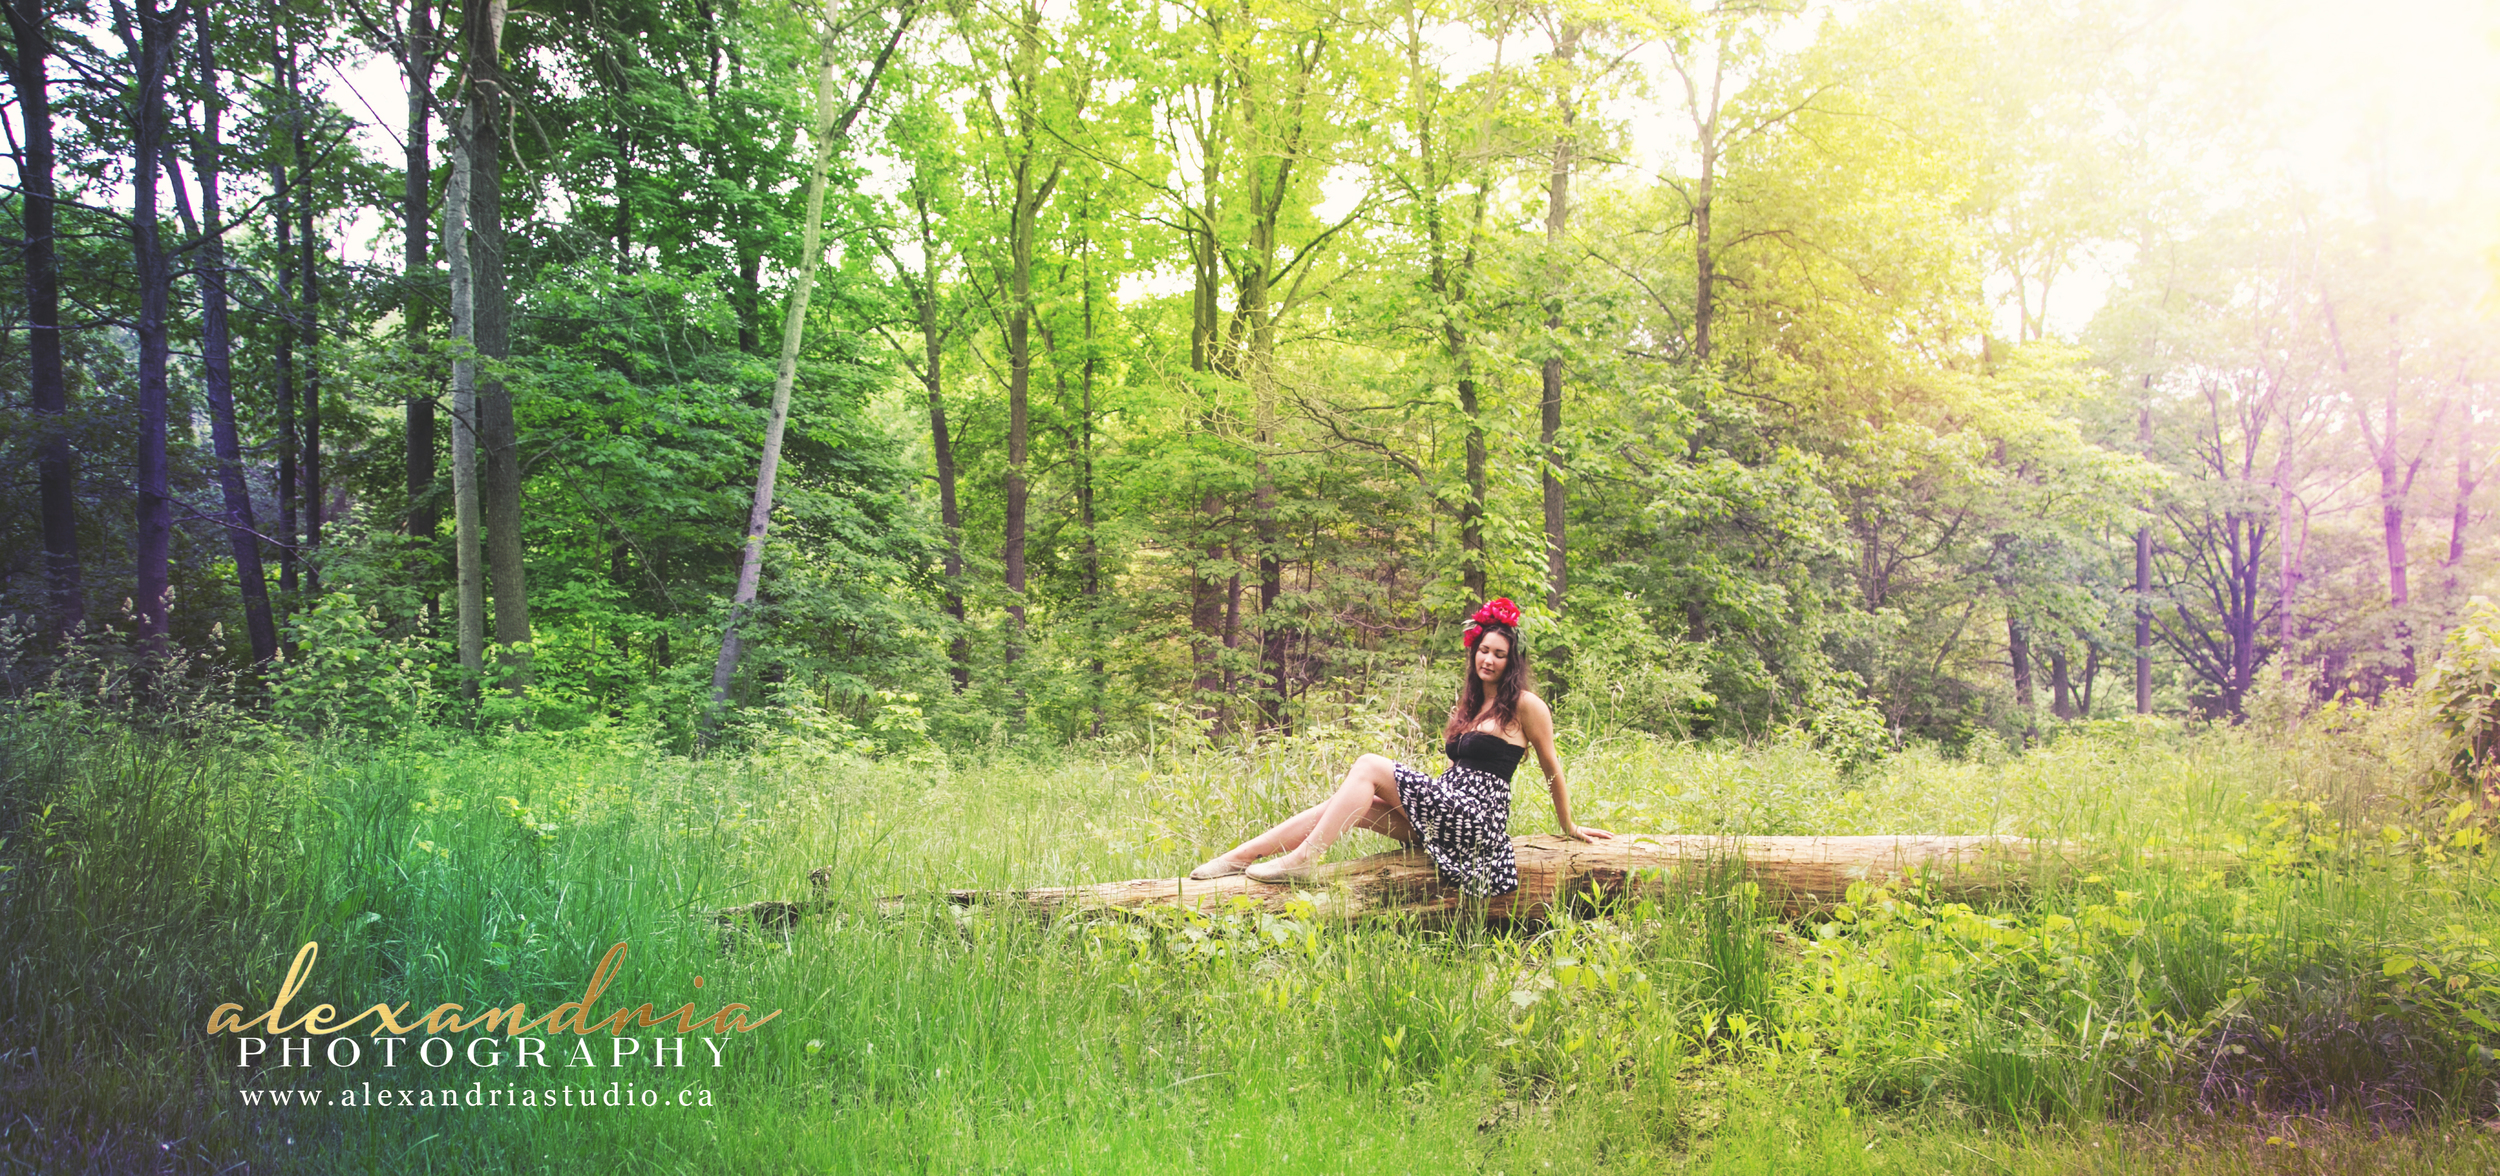 wmAlexandria Photography www.alexandriastudio.ca IMG_9402.jpg